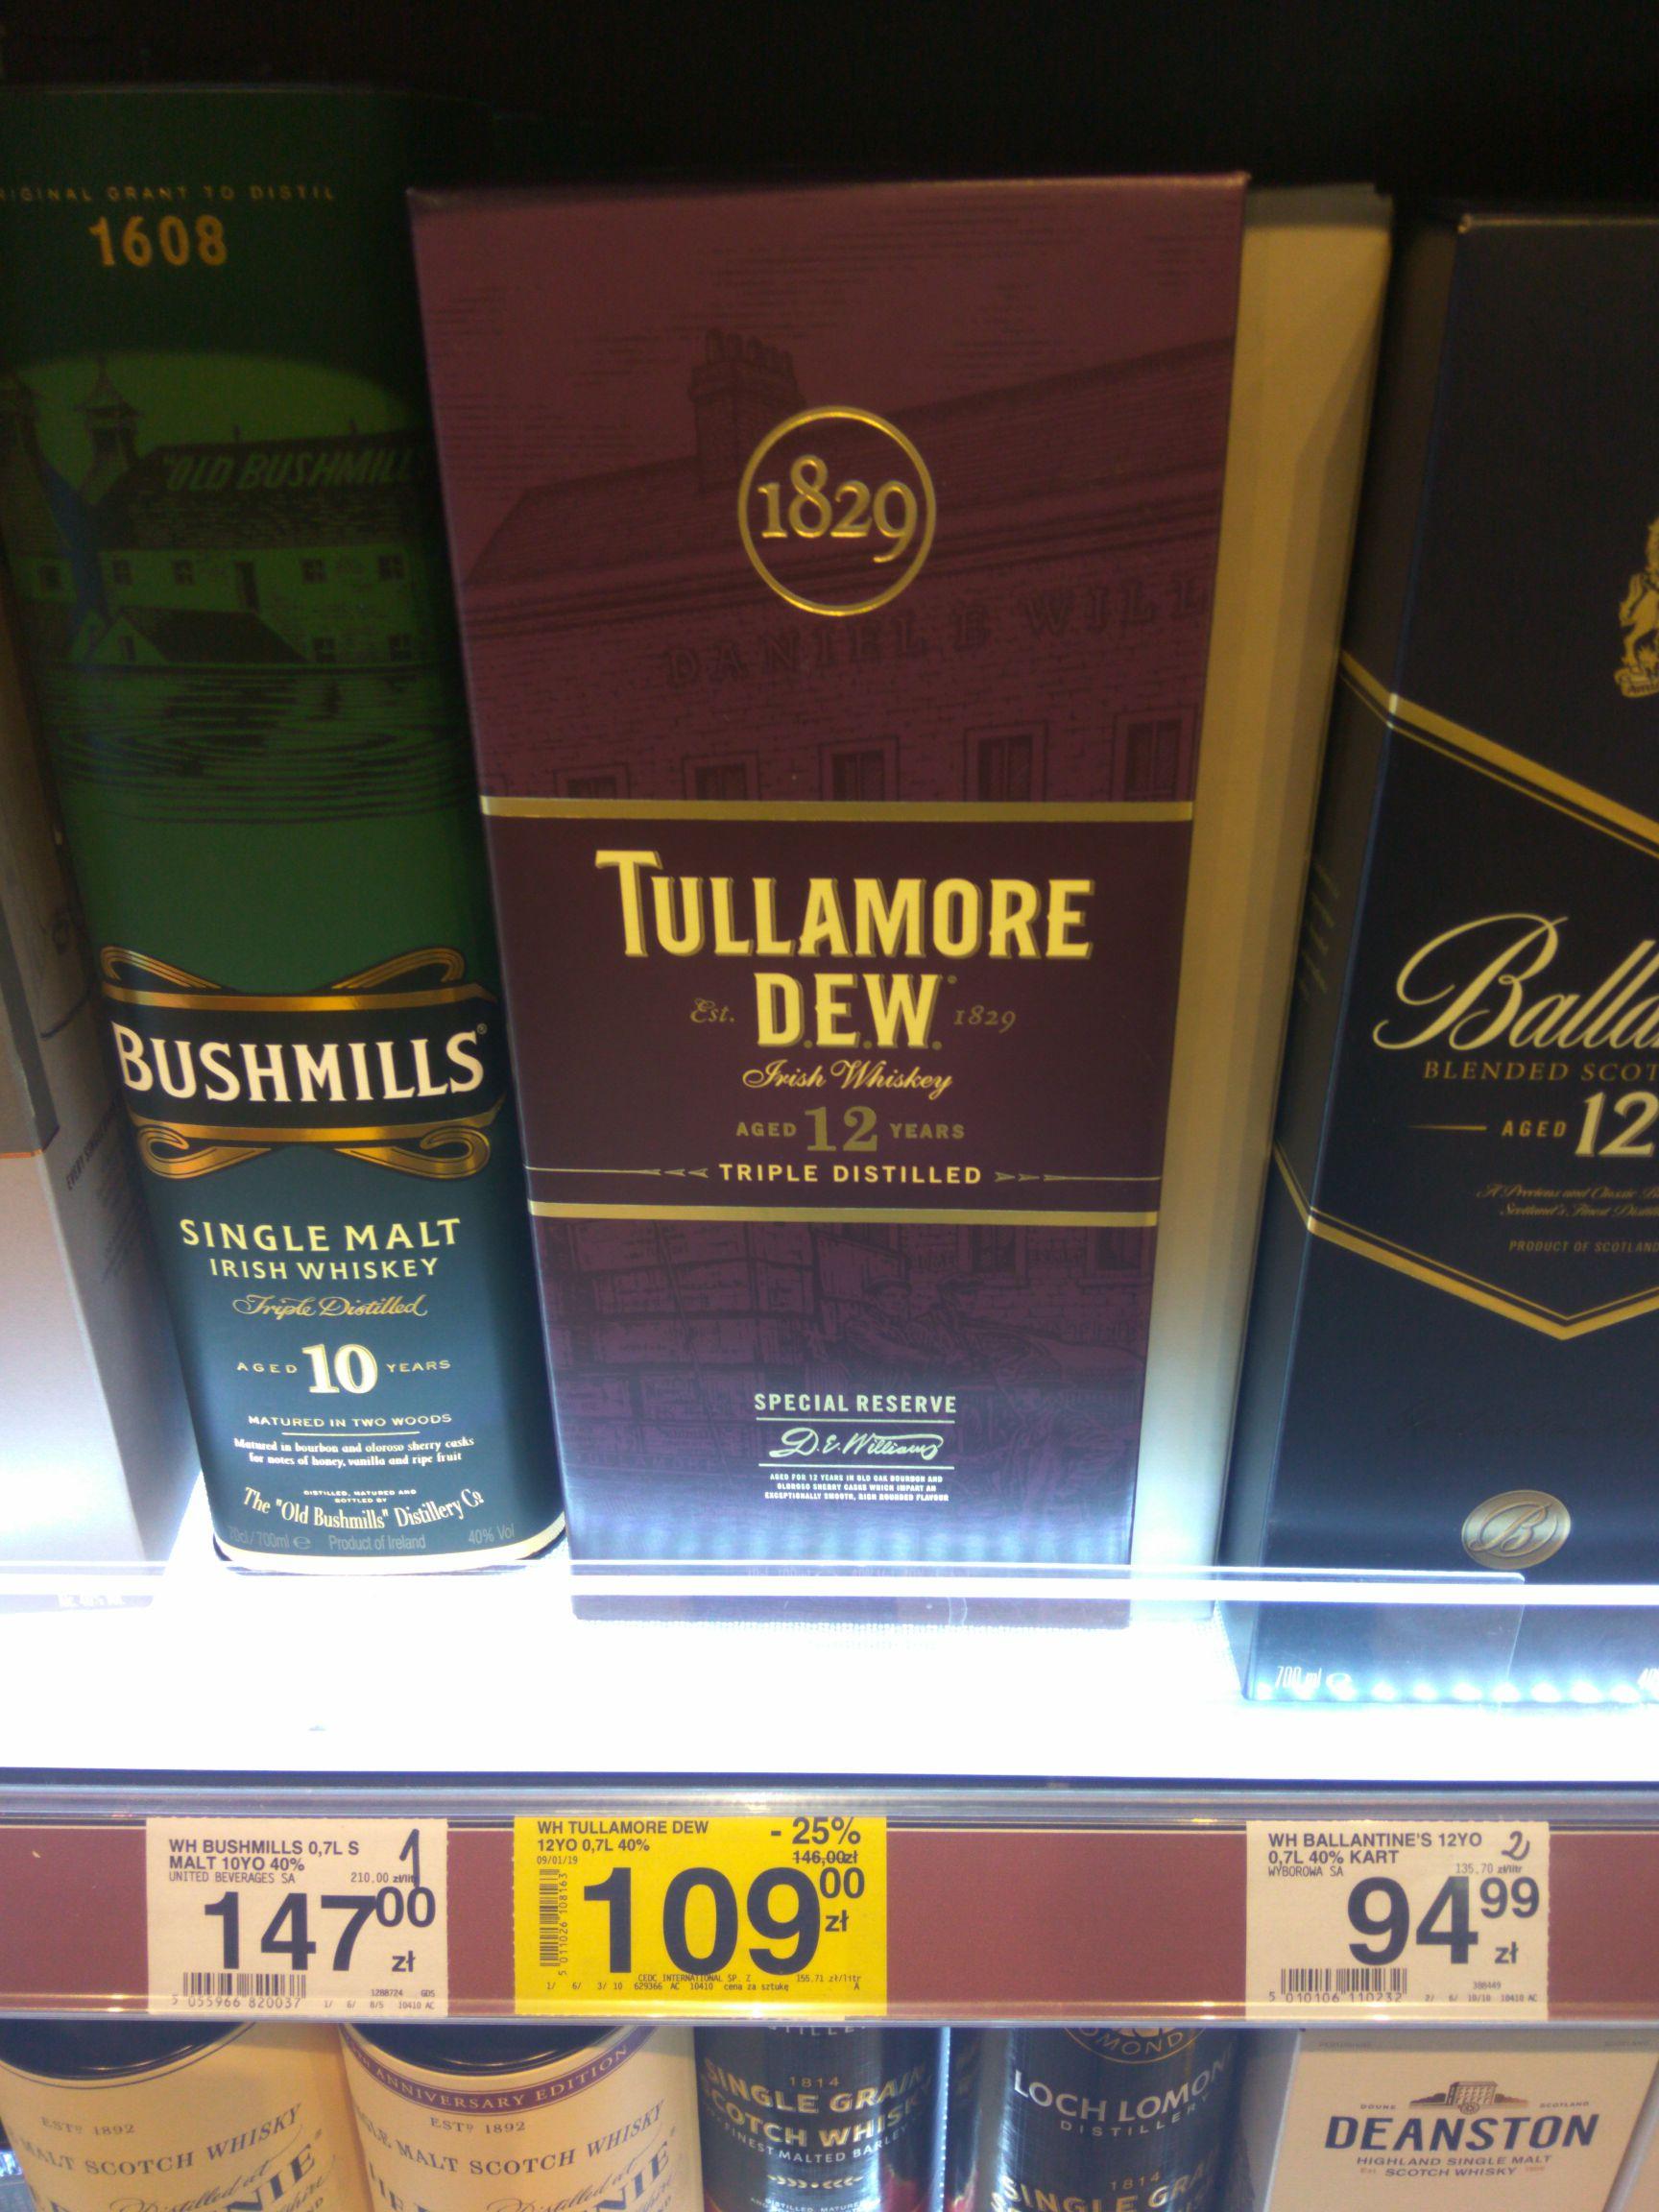 [Carrefour] Whiskey/Whisky: Tullamore Dew 12 - 109 zł, Balvenie 12 - 169 zł